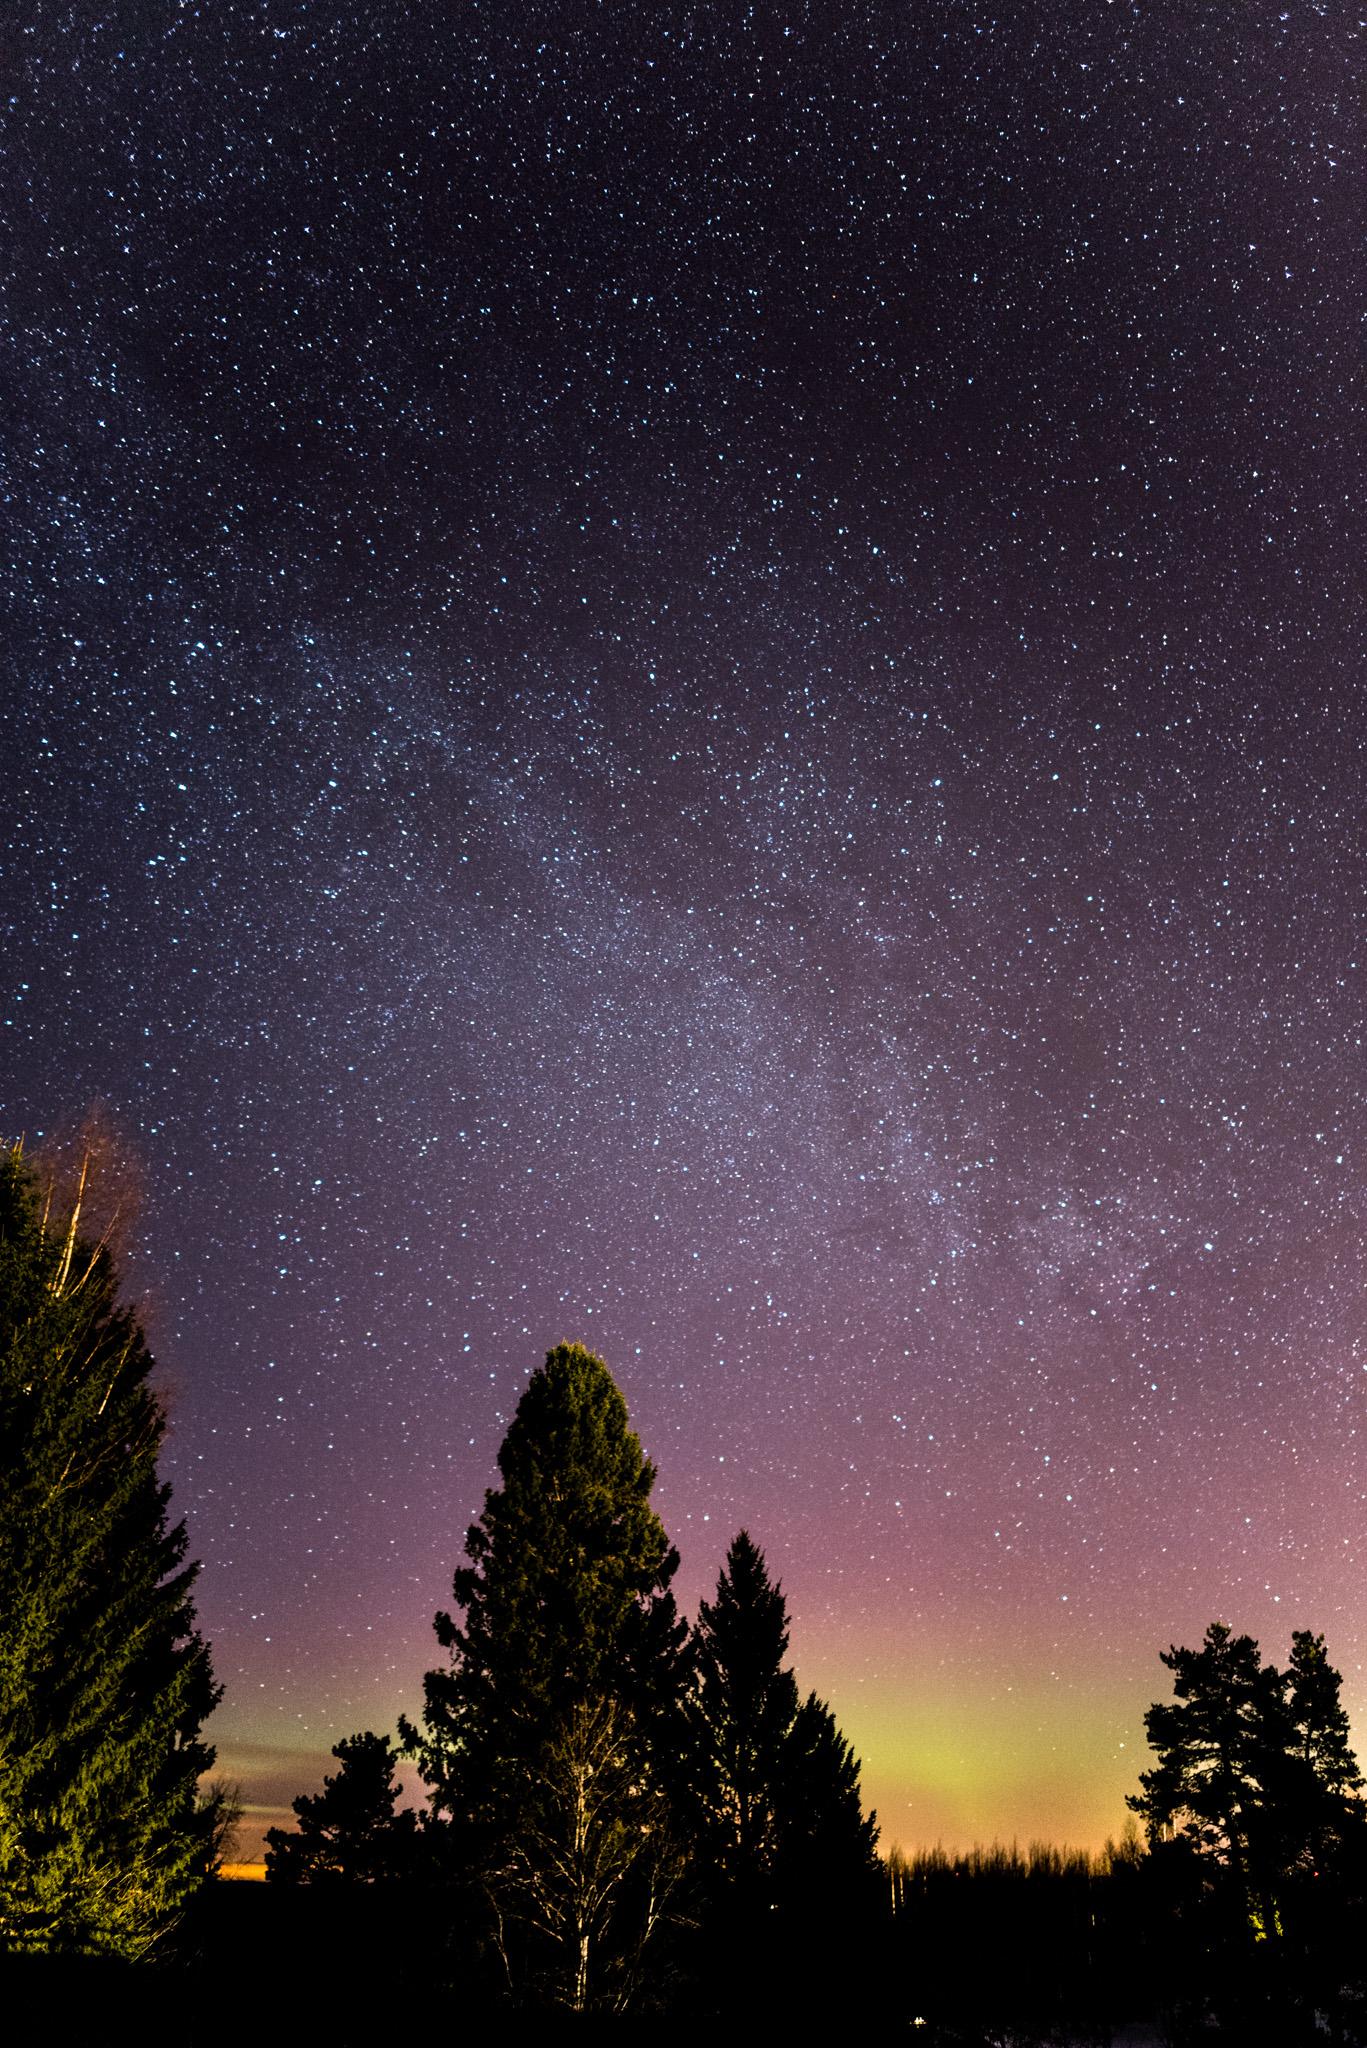 2017-03-20-Milky Way-24_LR edited_web-2.jpg